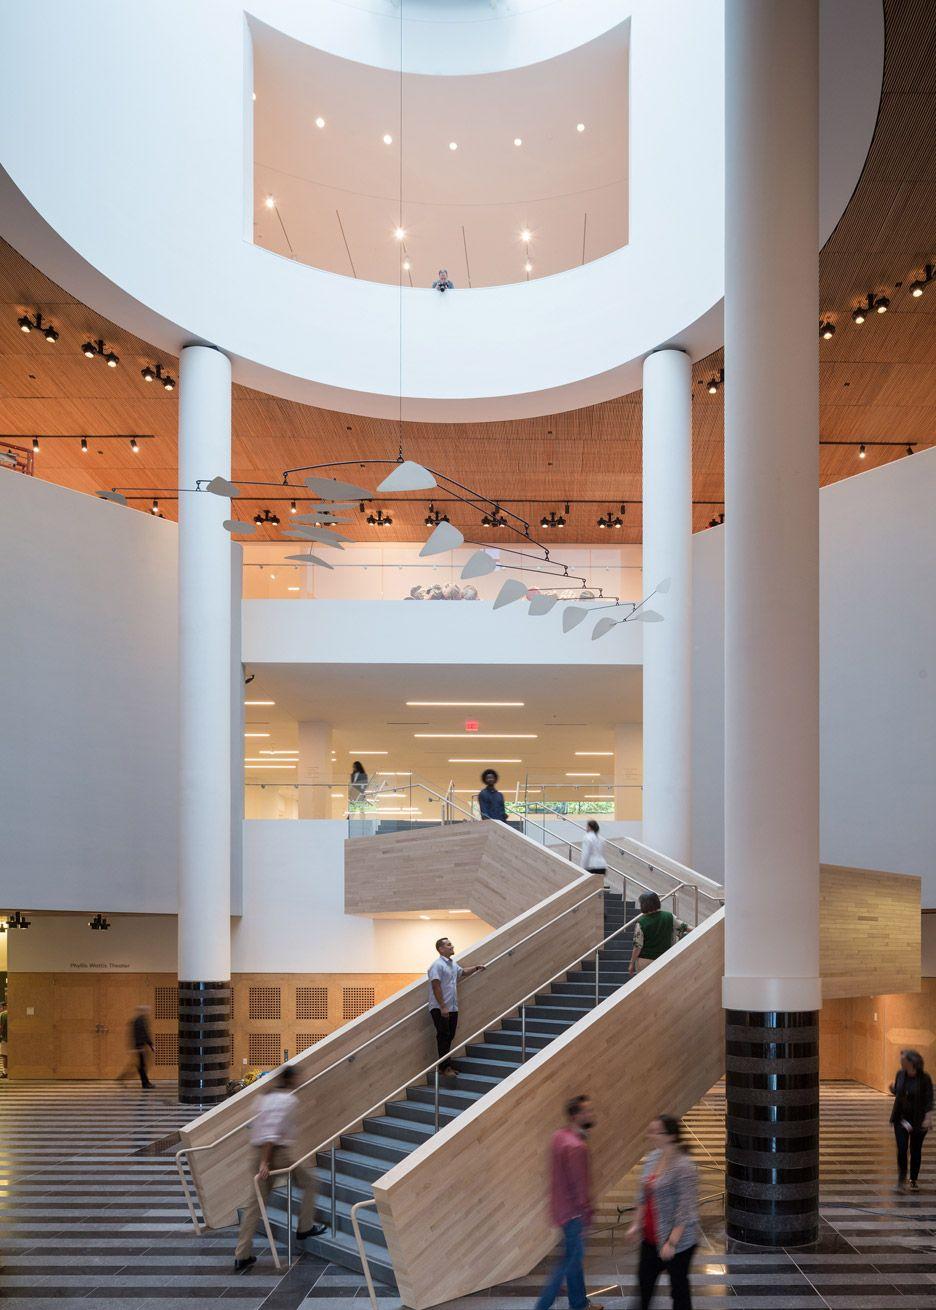 Sfmoma Museum Extension By Snohetta In San Francisco Usa San